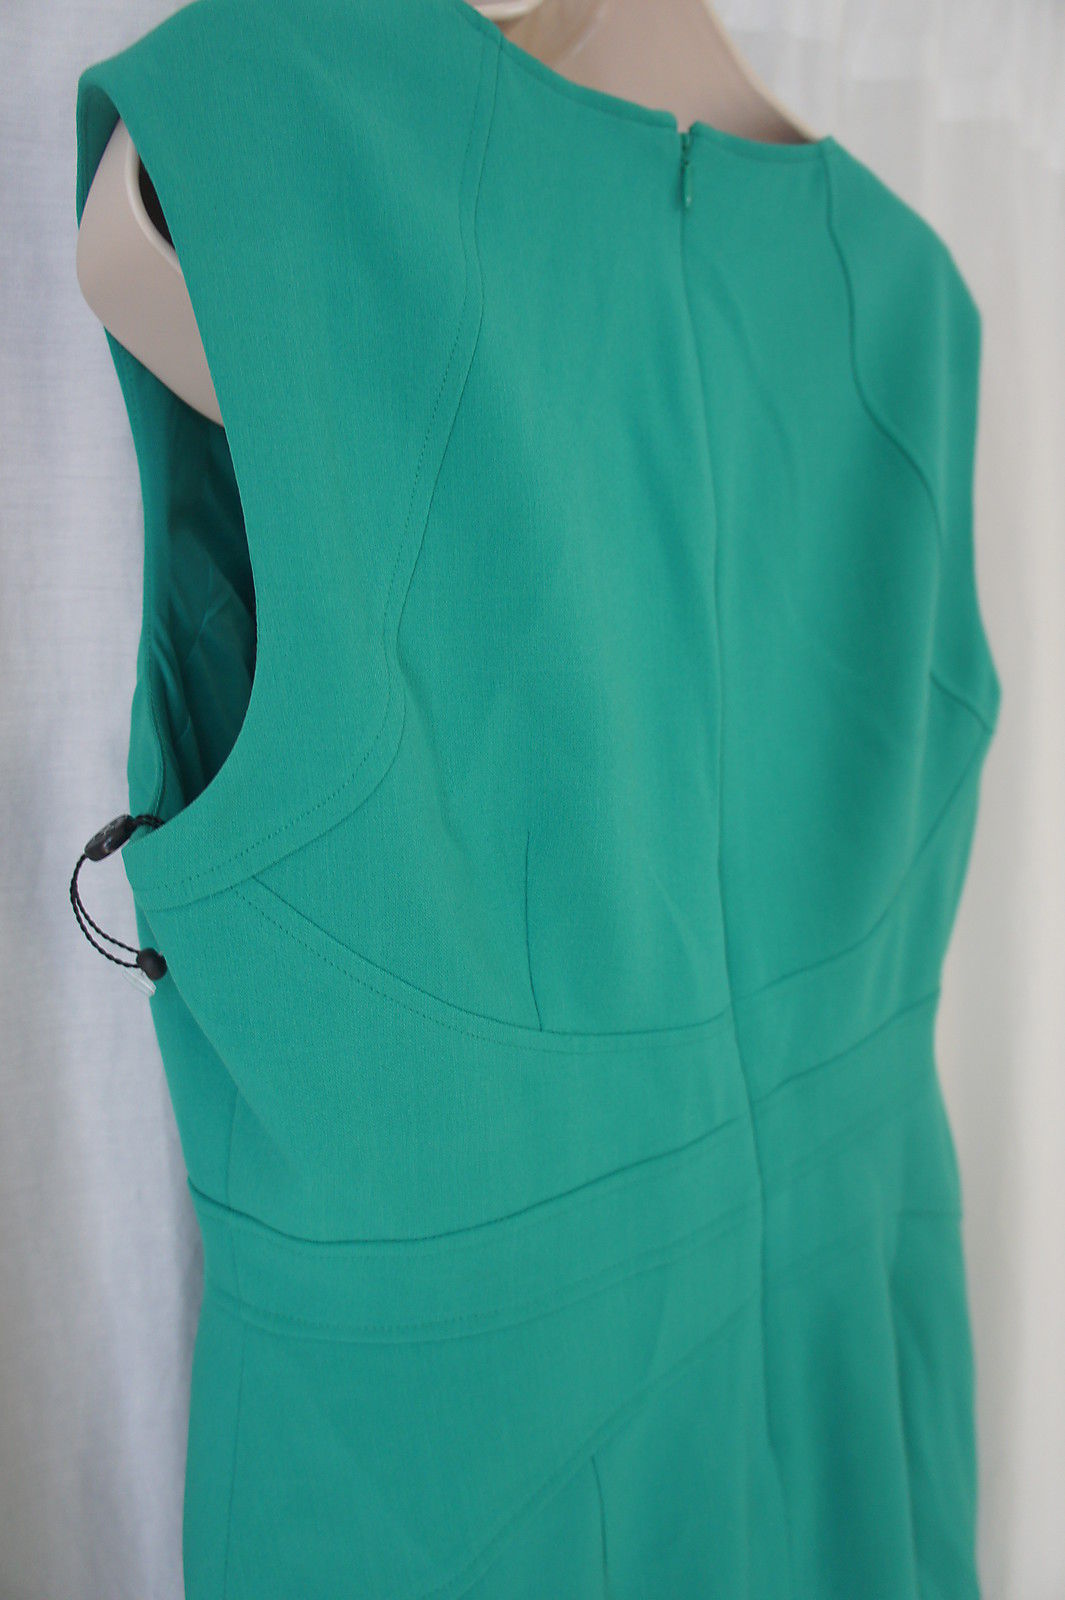 Anne Klein Petite Dress 8P Kelly Green Textured A-Line Sleeveless Career Dress